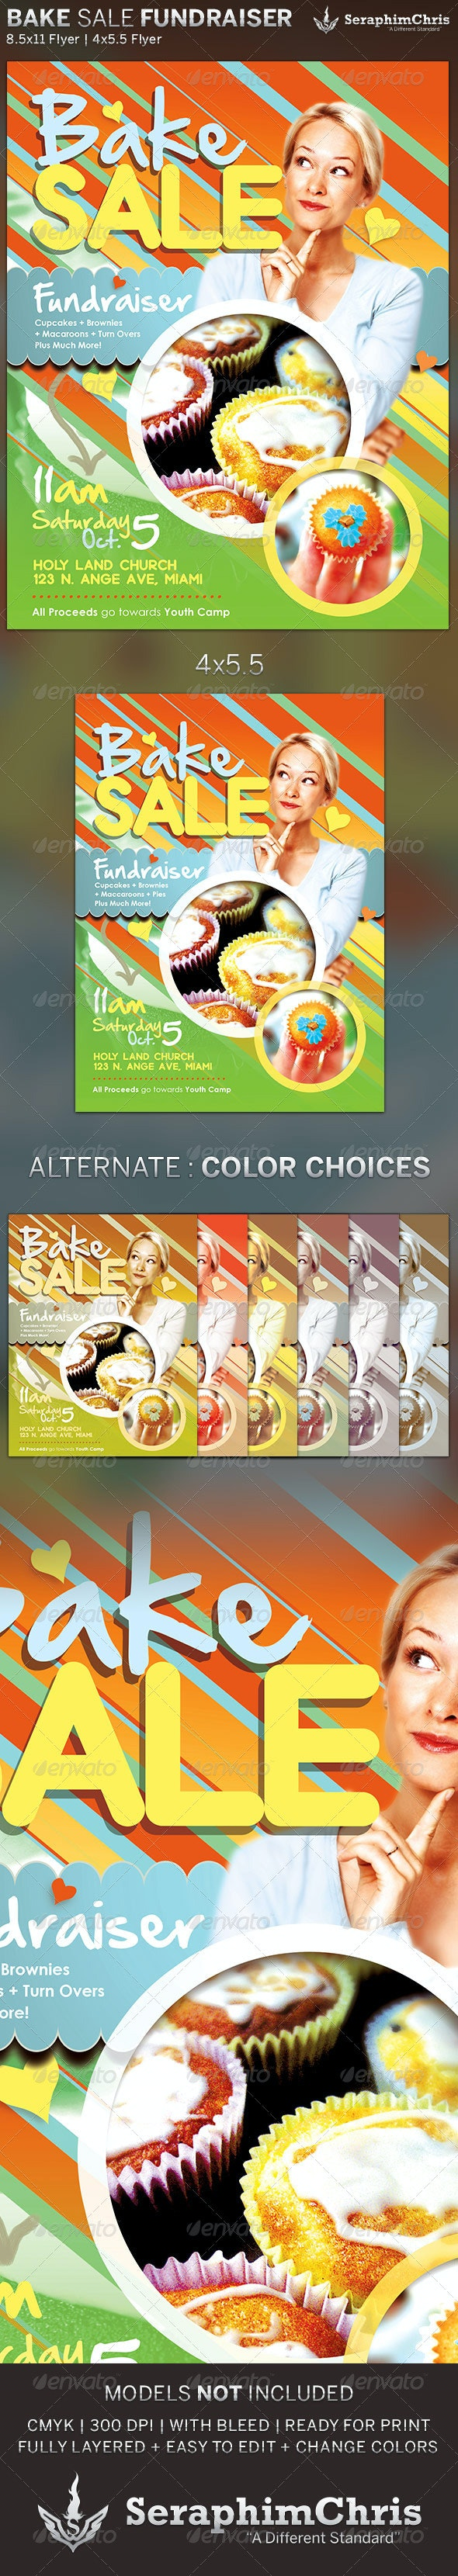 Bake Sale: Church Fundraiser Flyer Template  - Print Templates